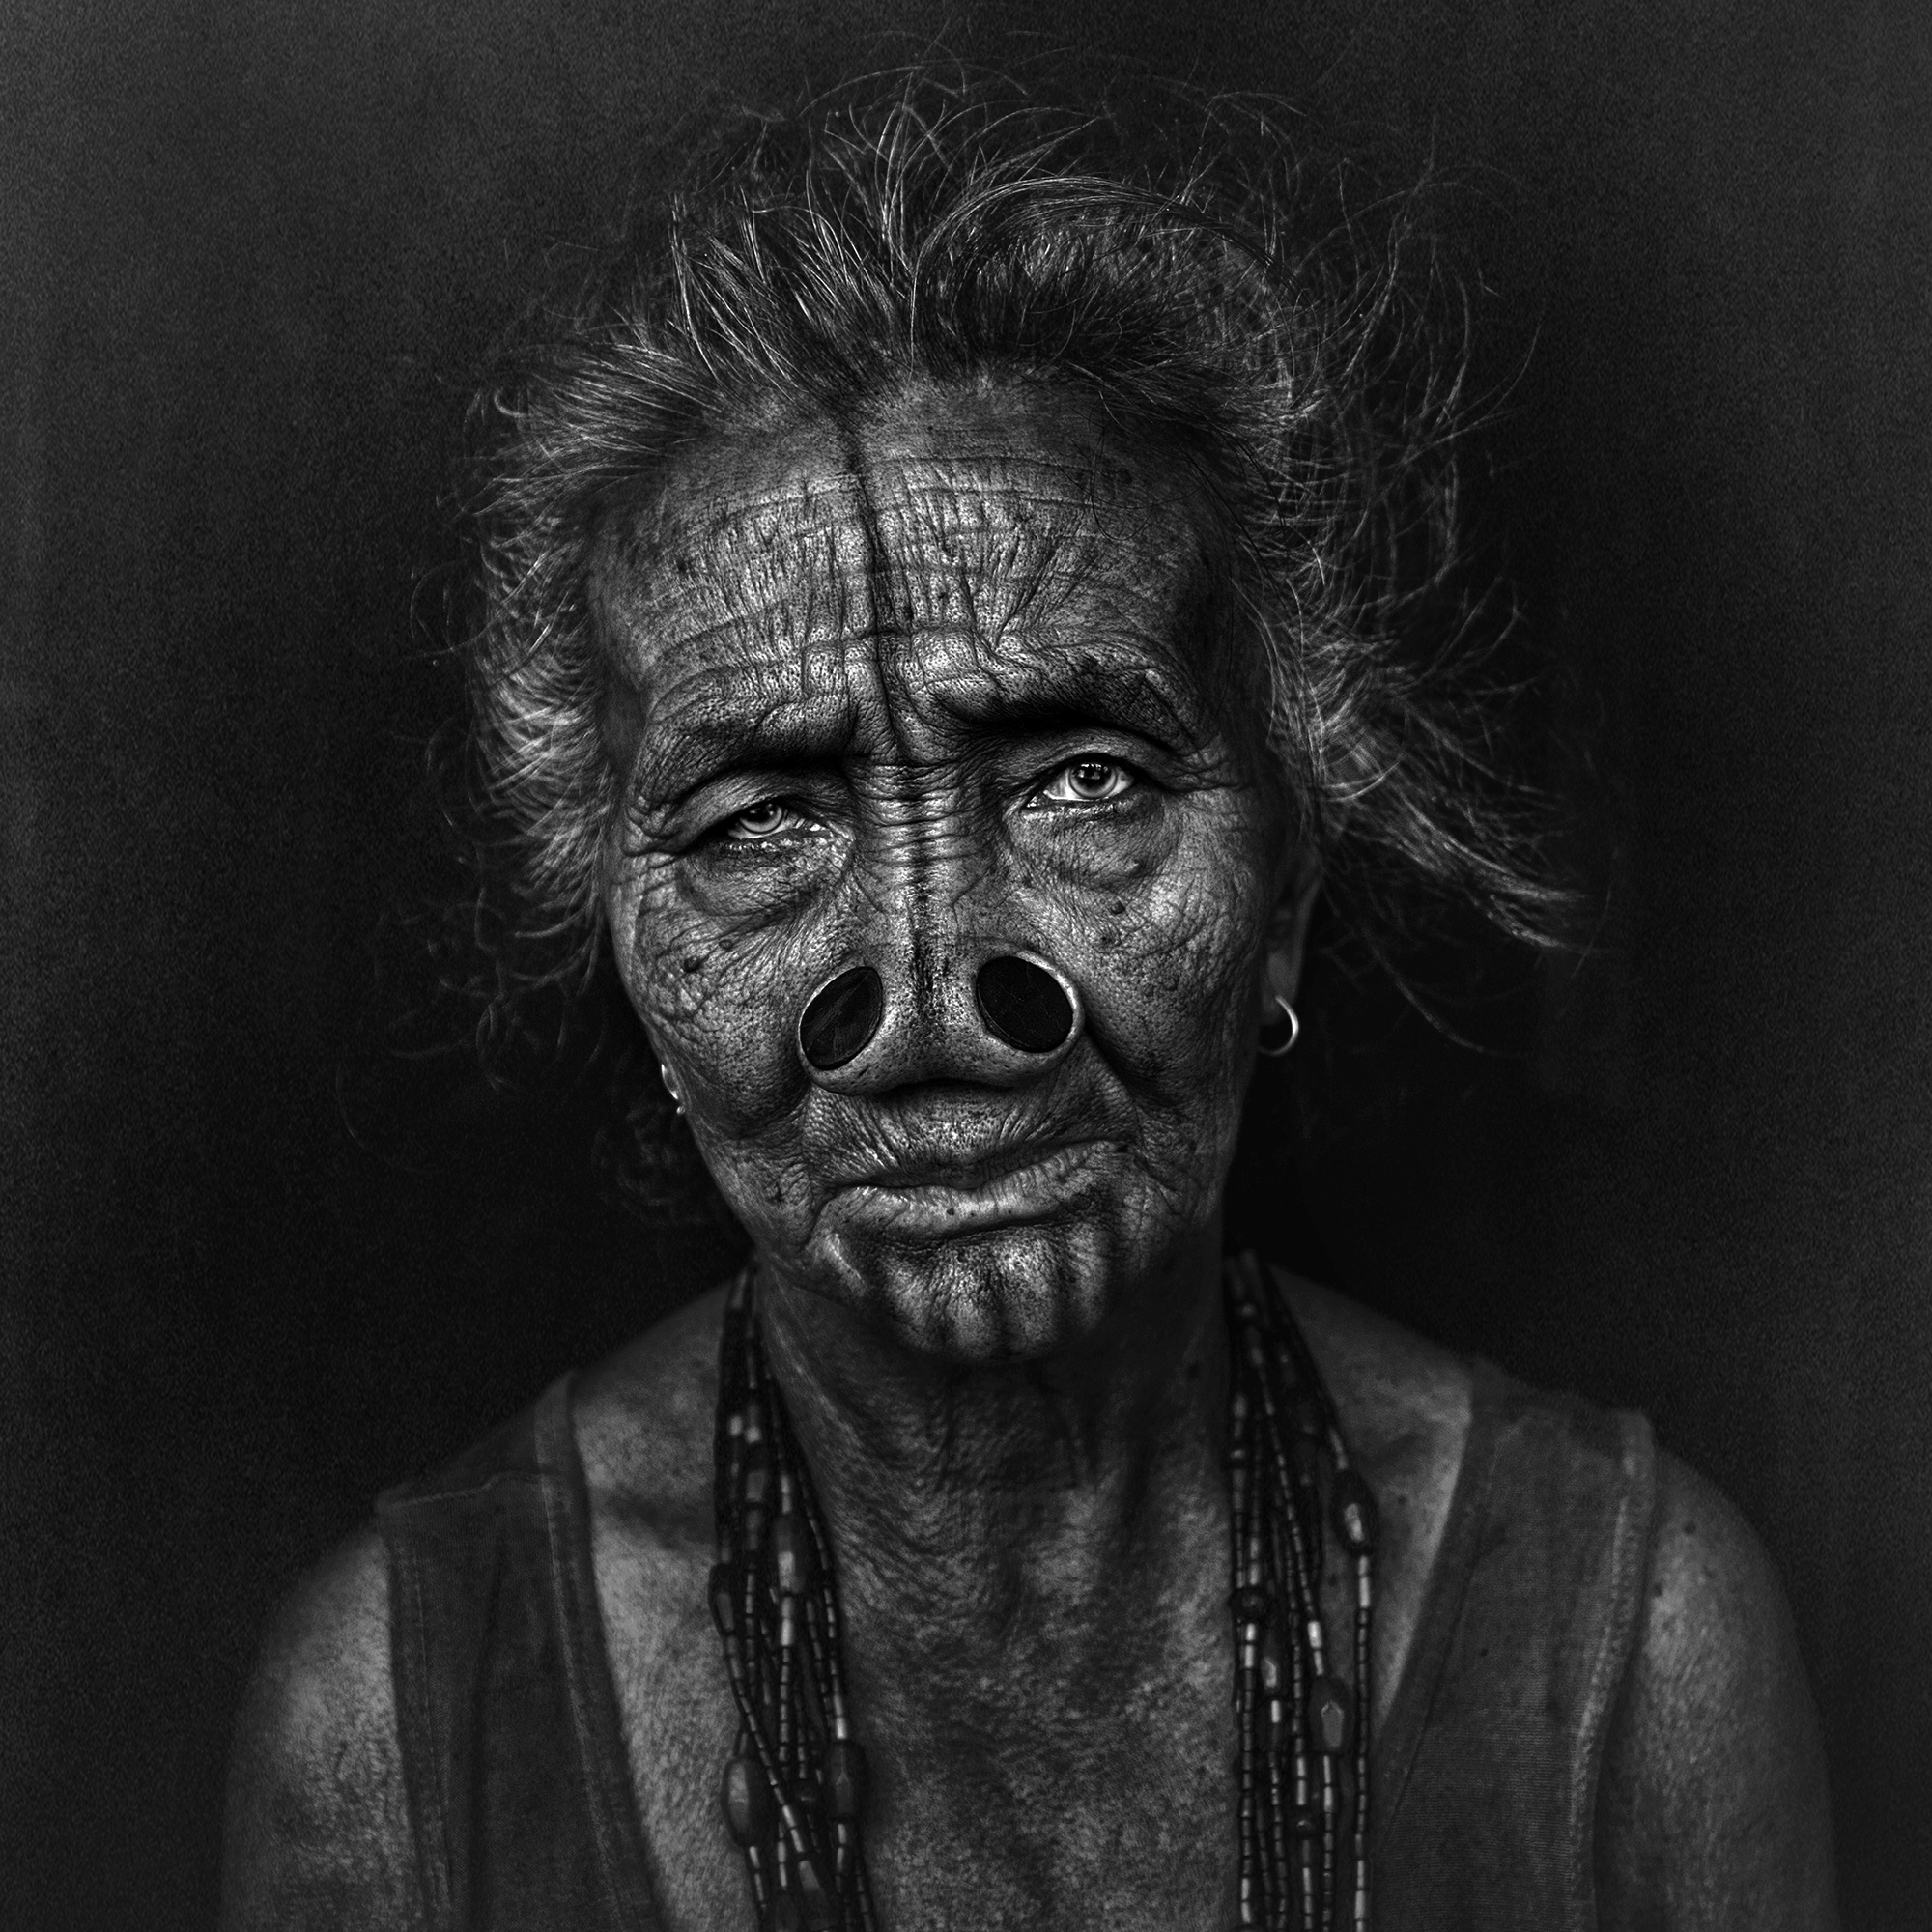 """It's been a long journey"" – Monochrome Portraits by Fadhel Almutaghawi"